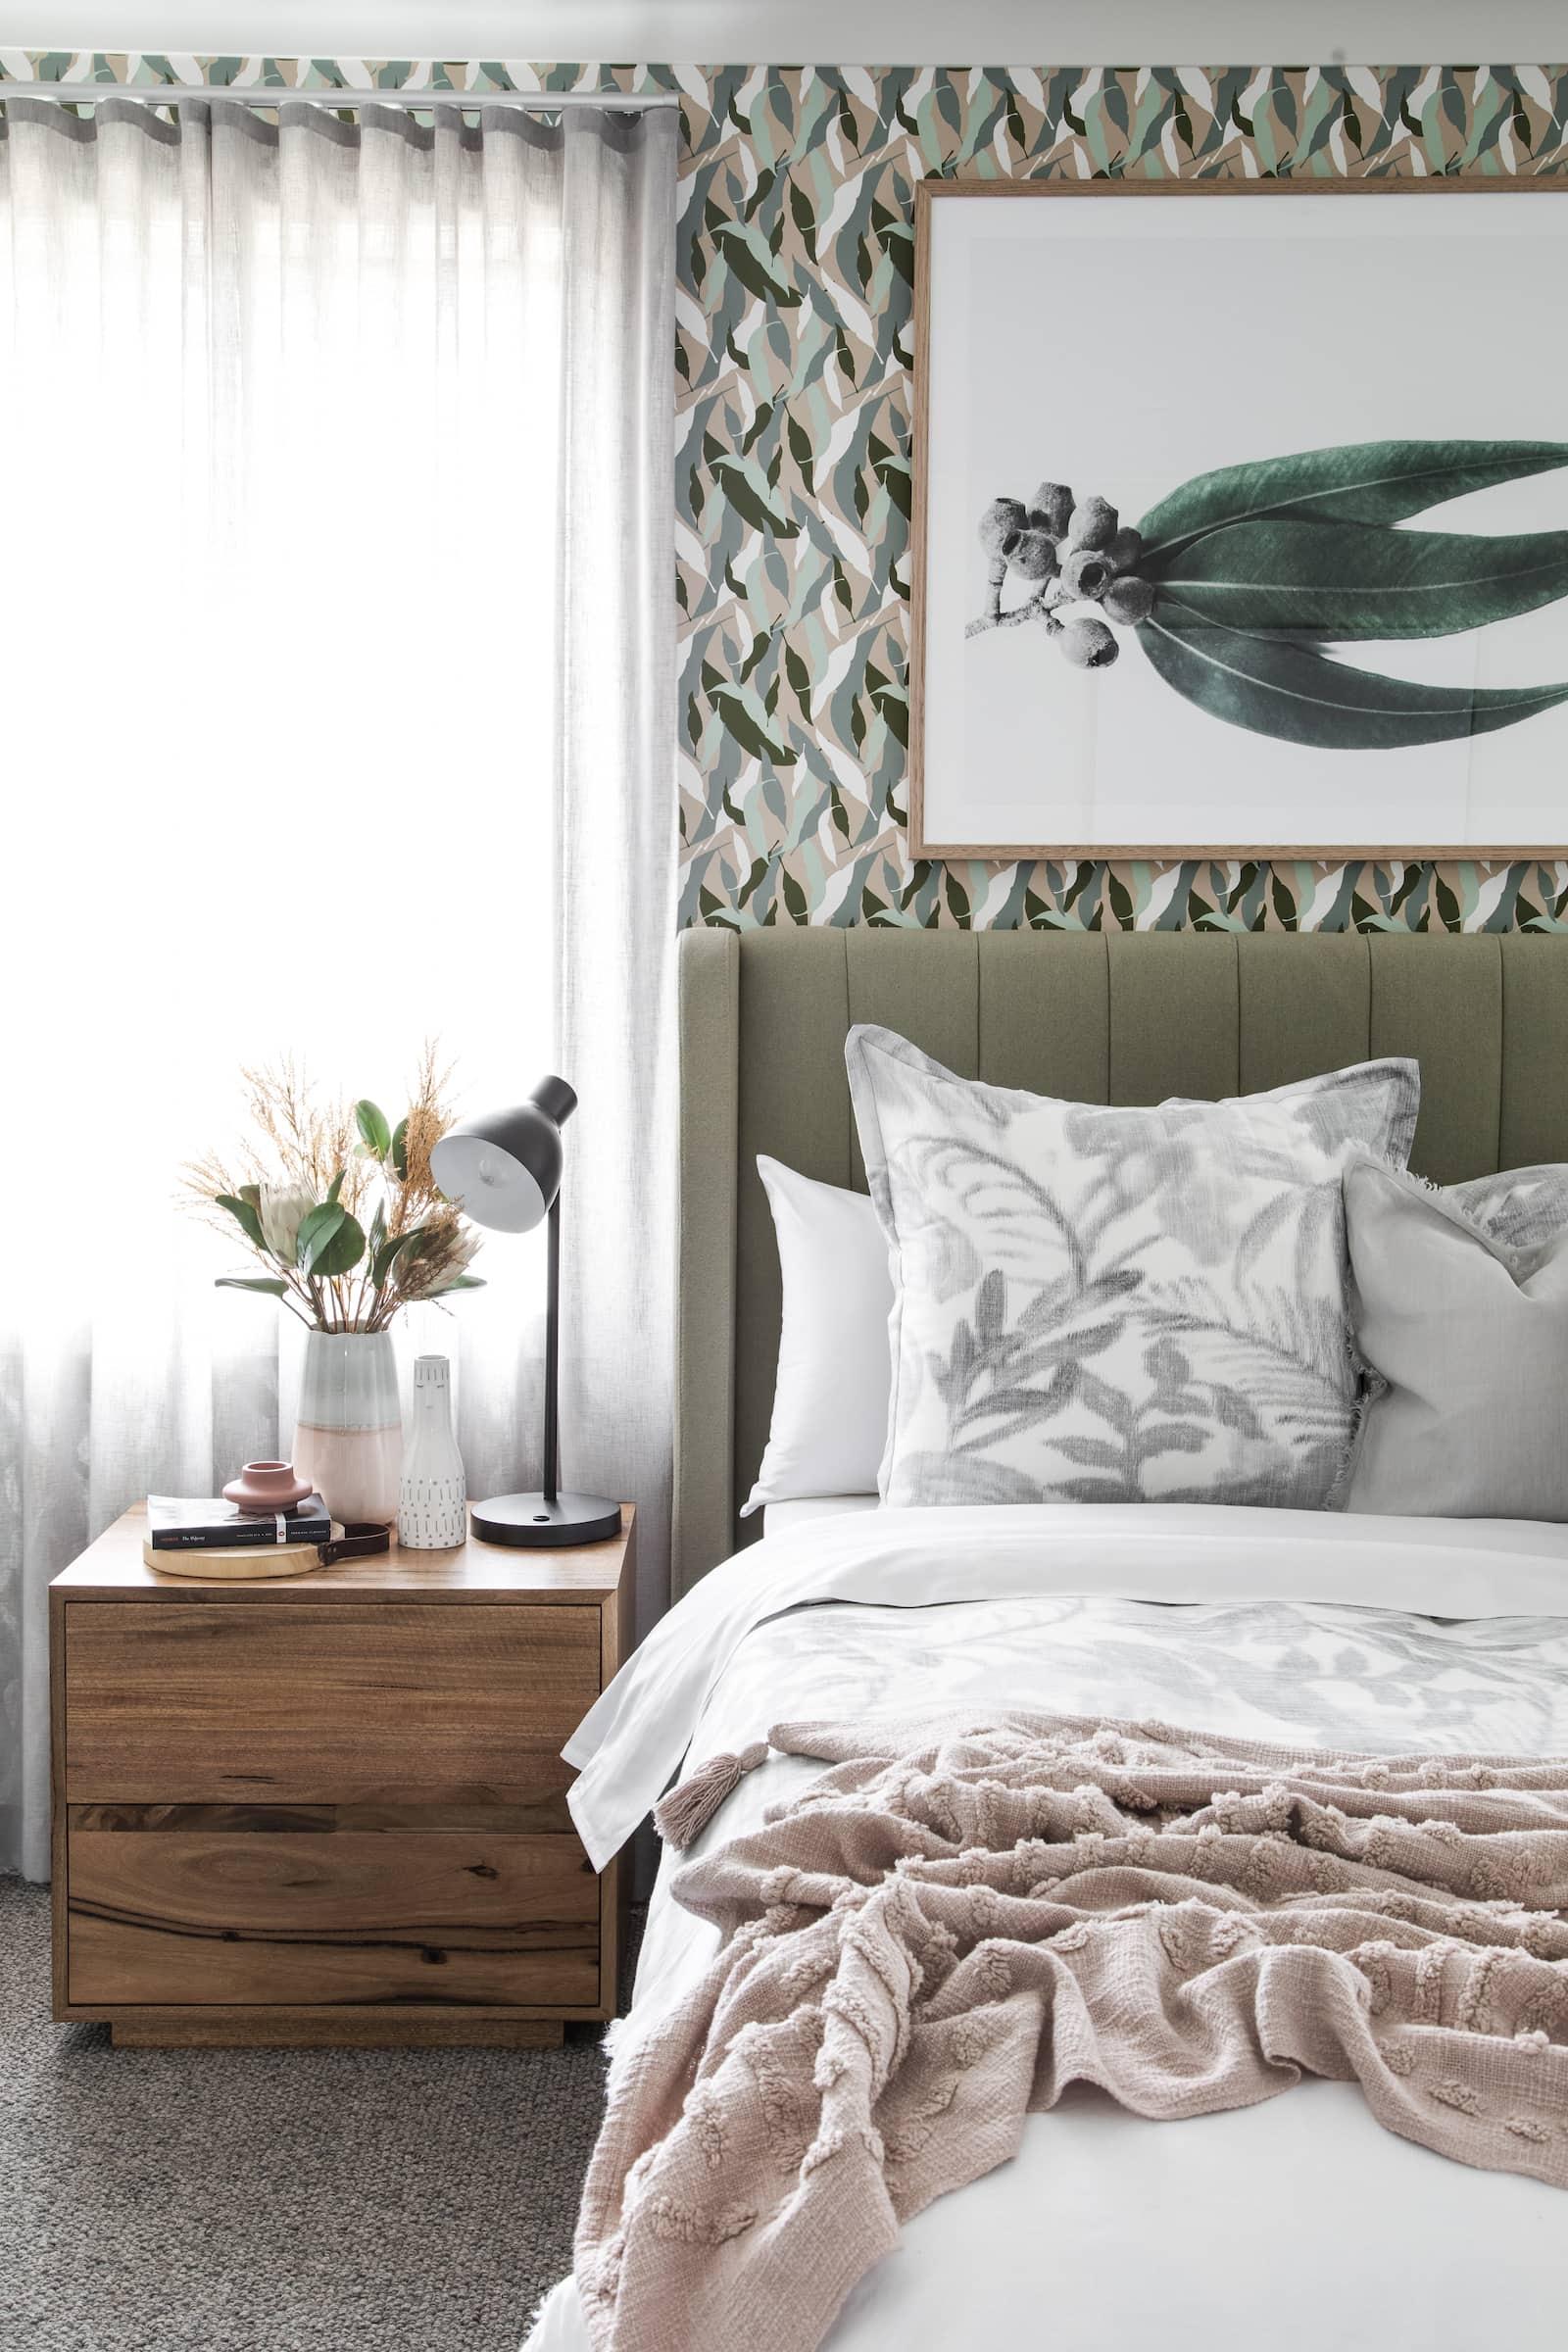 australiana bedroom design with eucalyptus wall art and wallpaper